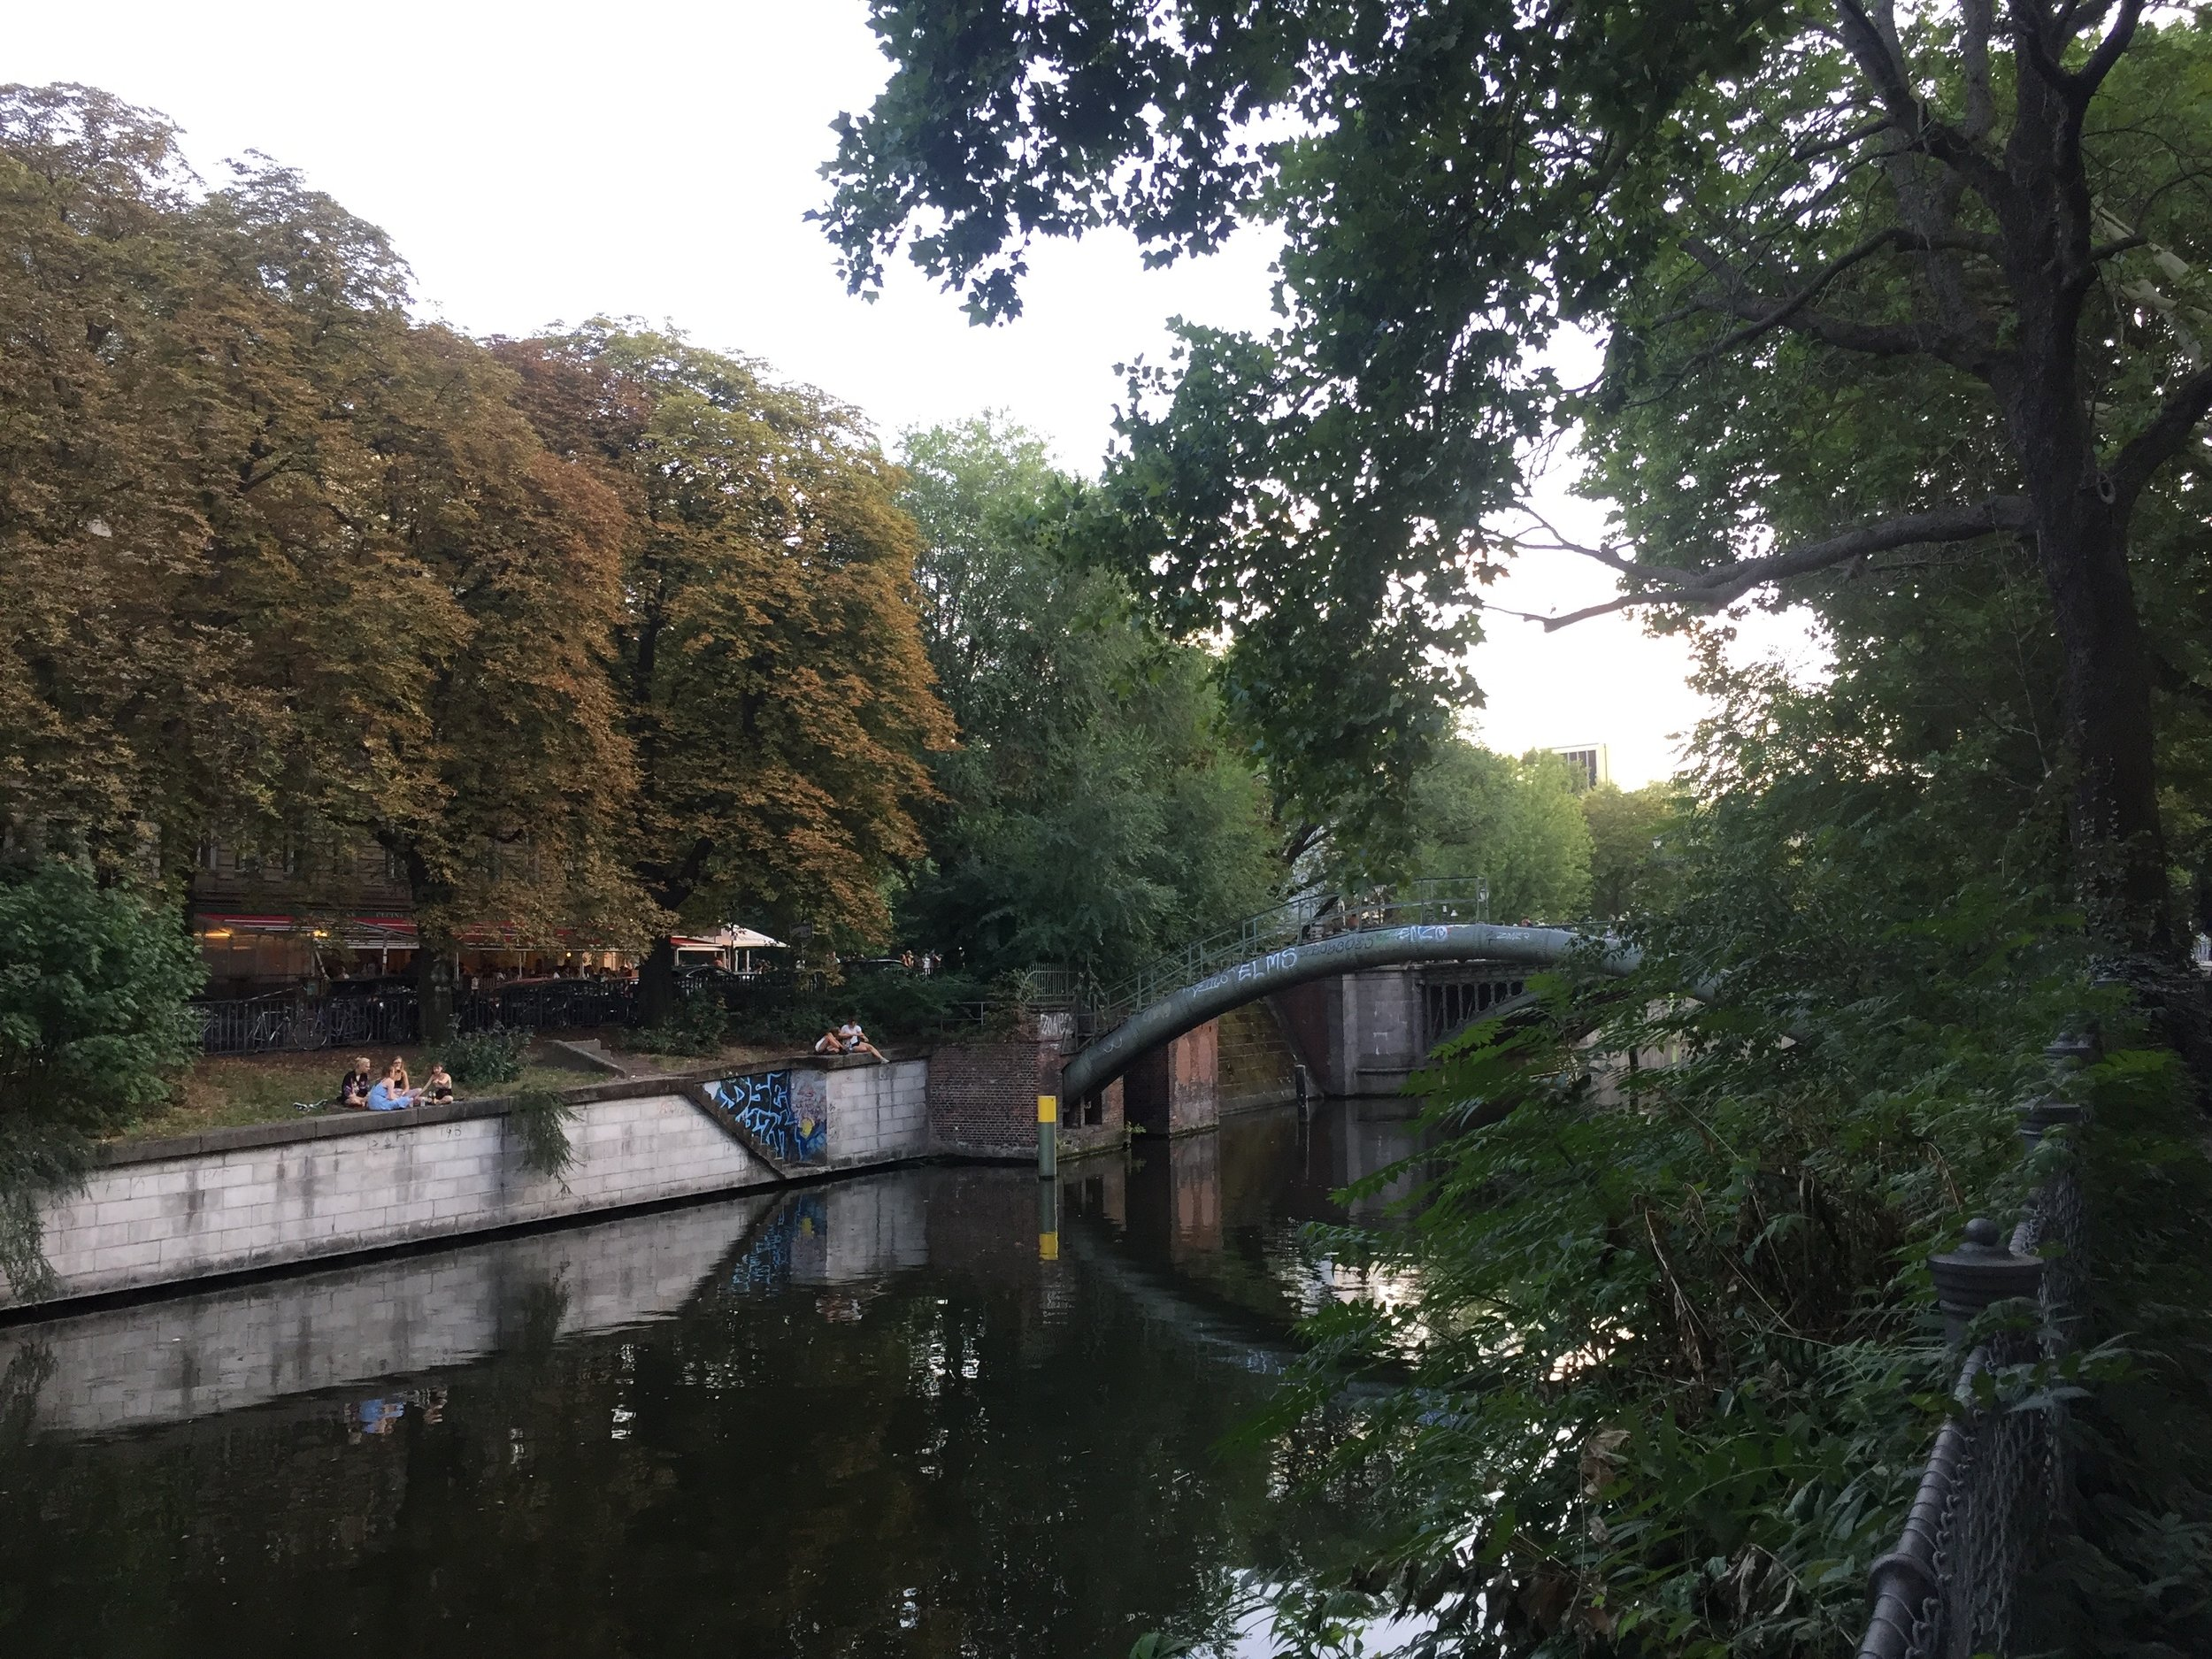 Zen walks absorbing the atmosphere of Kreuzberg by the river.